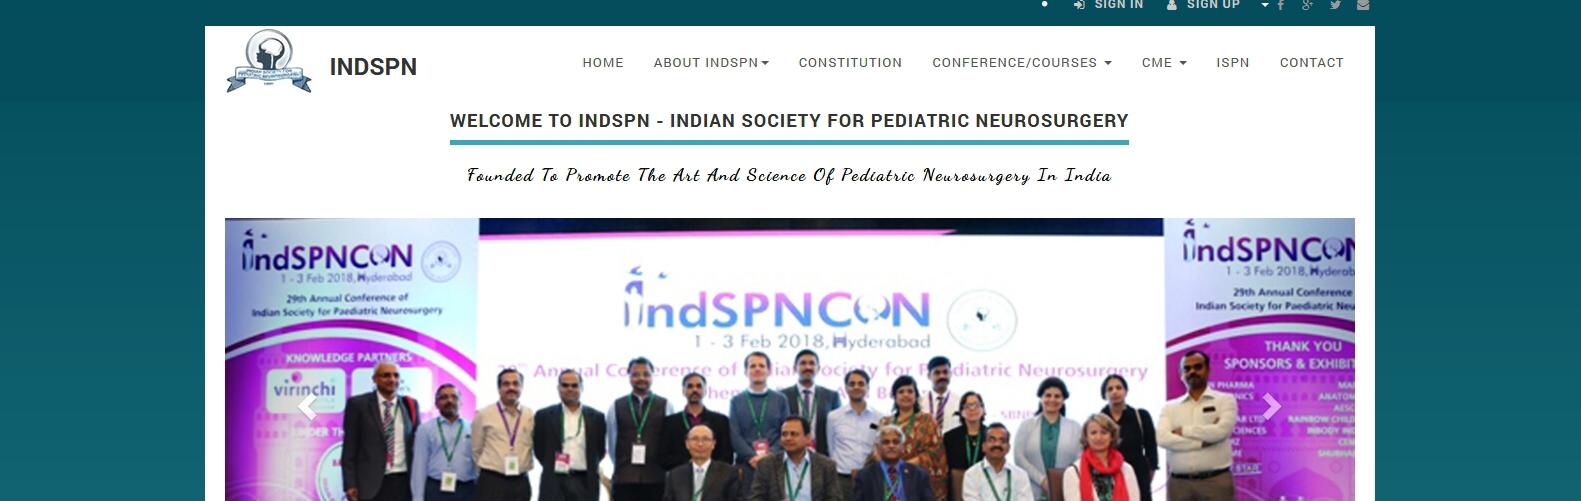 indspn-homepage-c